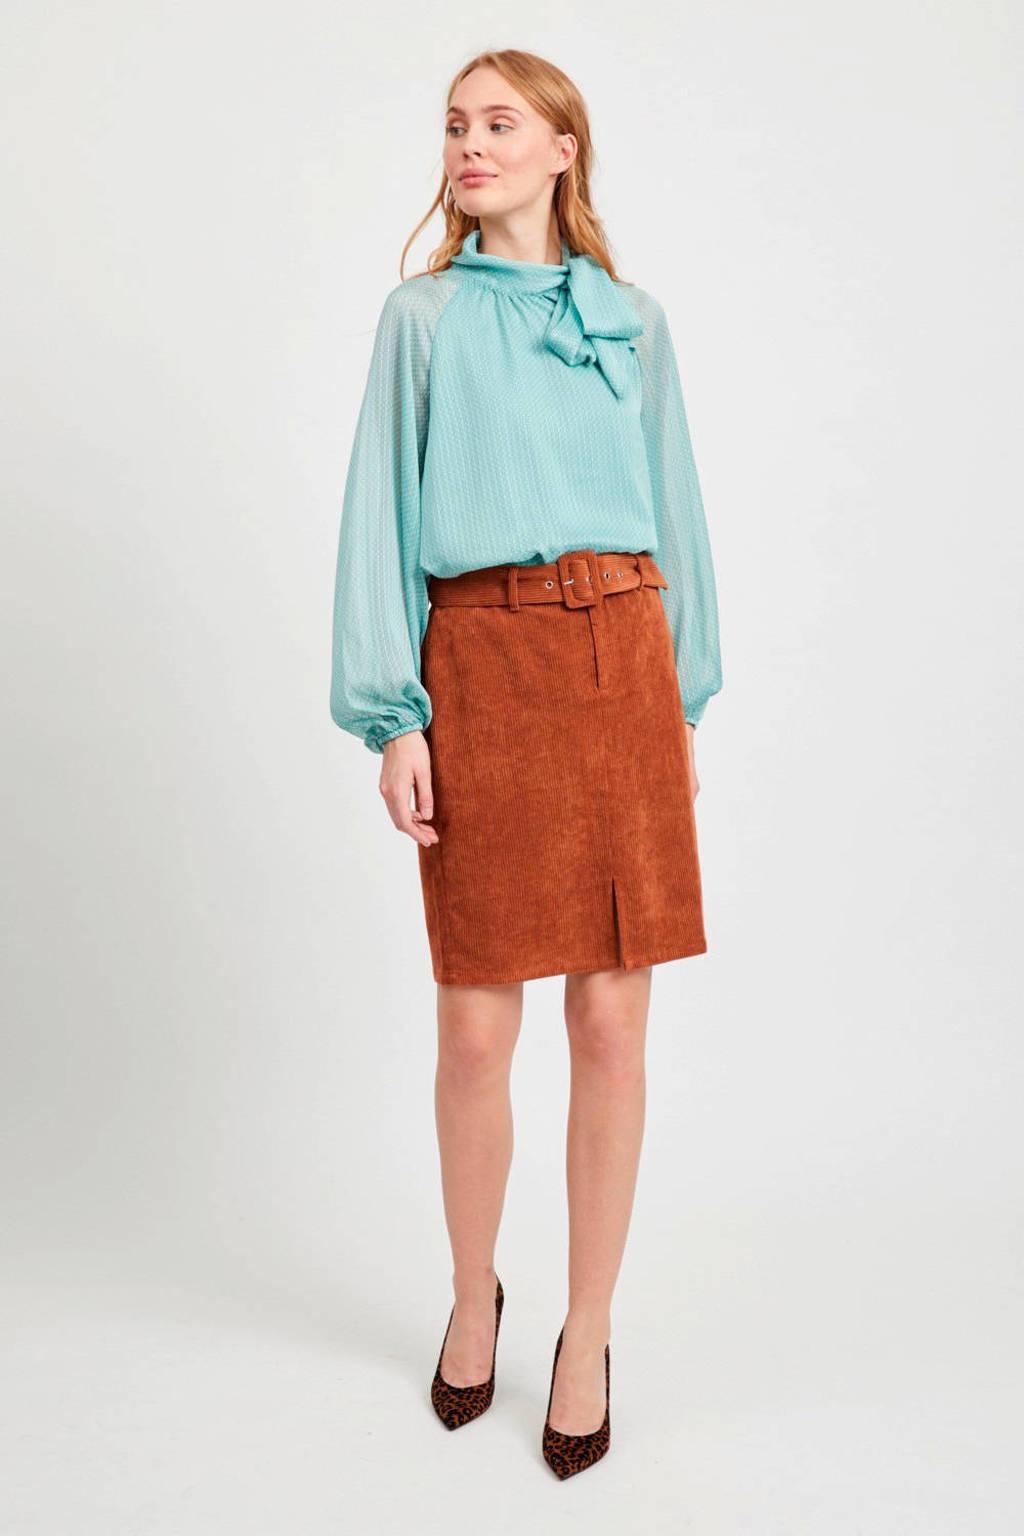 VILA blouse turquoise, Turquoise